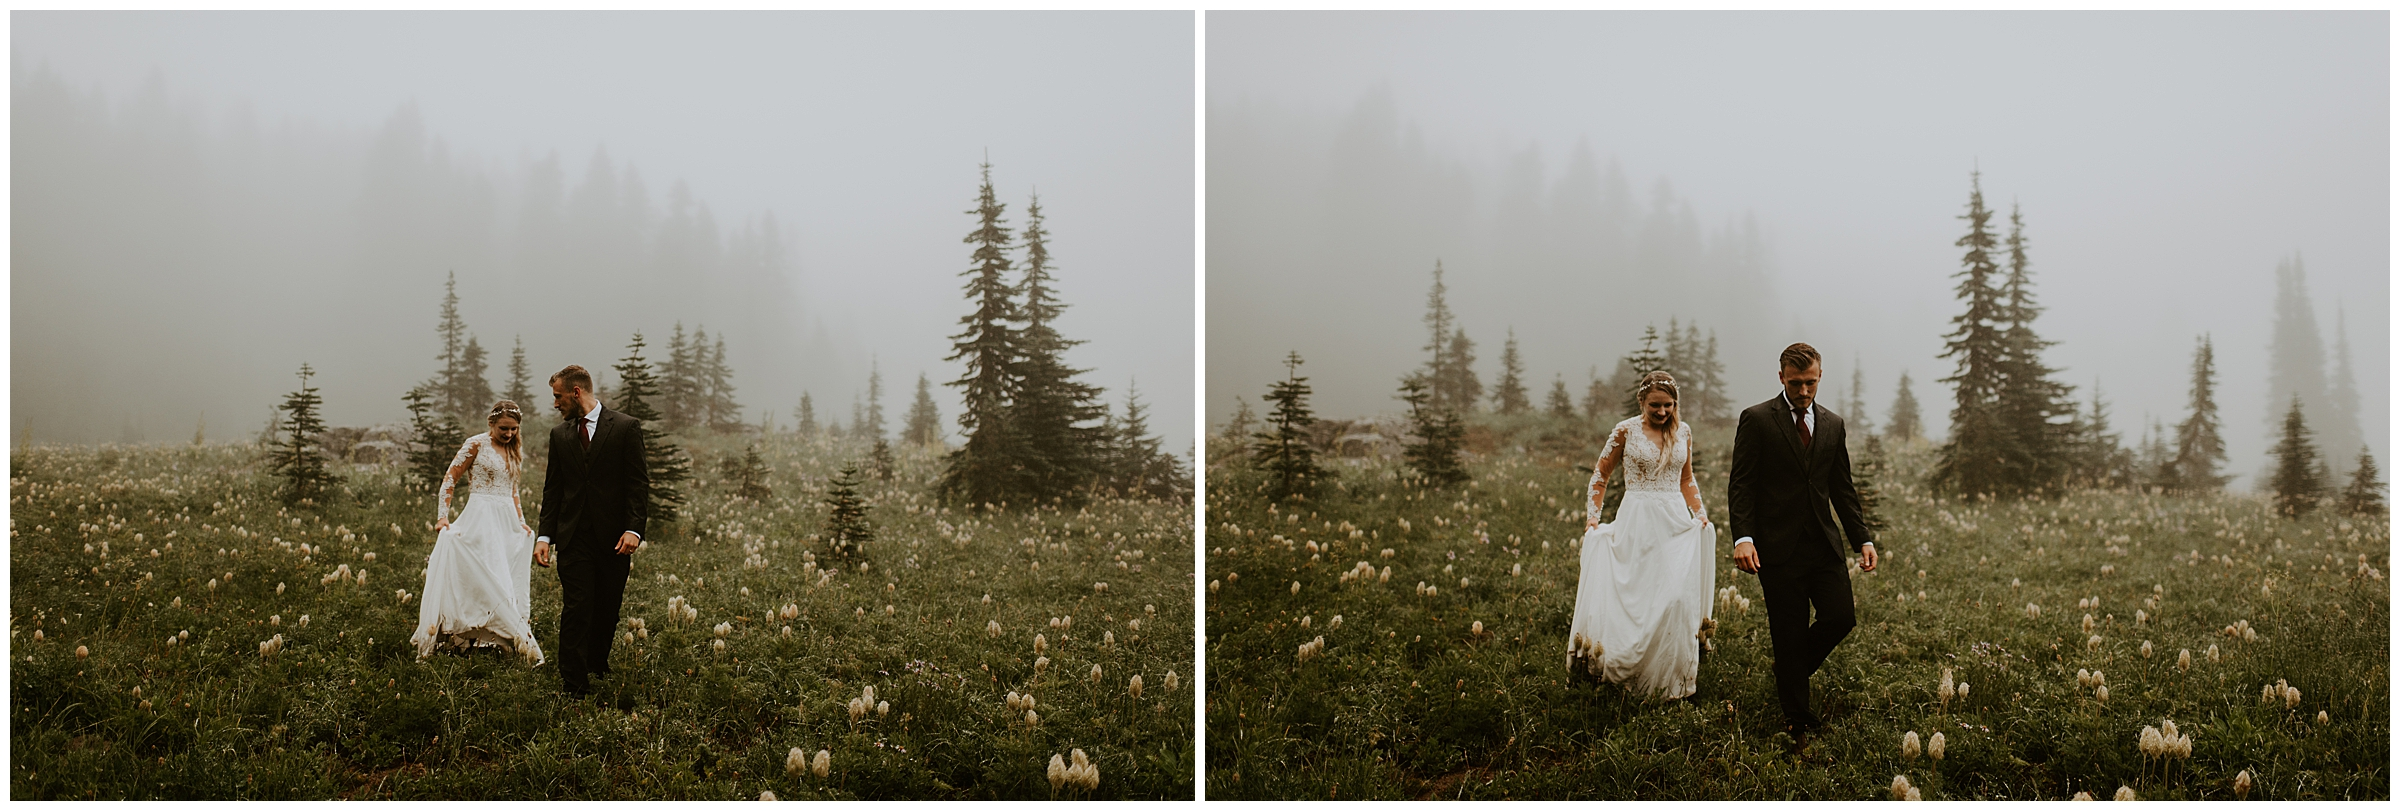 Cameo + Dawson's Foggy Mt. Rainier Wedding Portrait Session at Tipsoo Lake, WA by Seattle Elopement Photographer, Kamra Fuller Photography